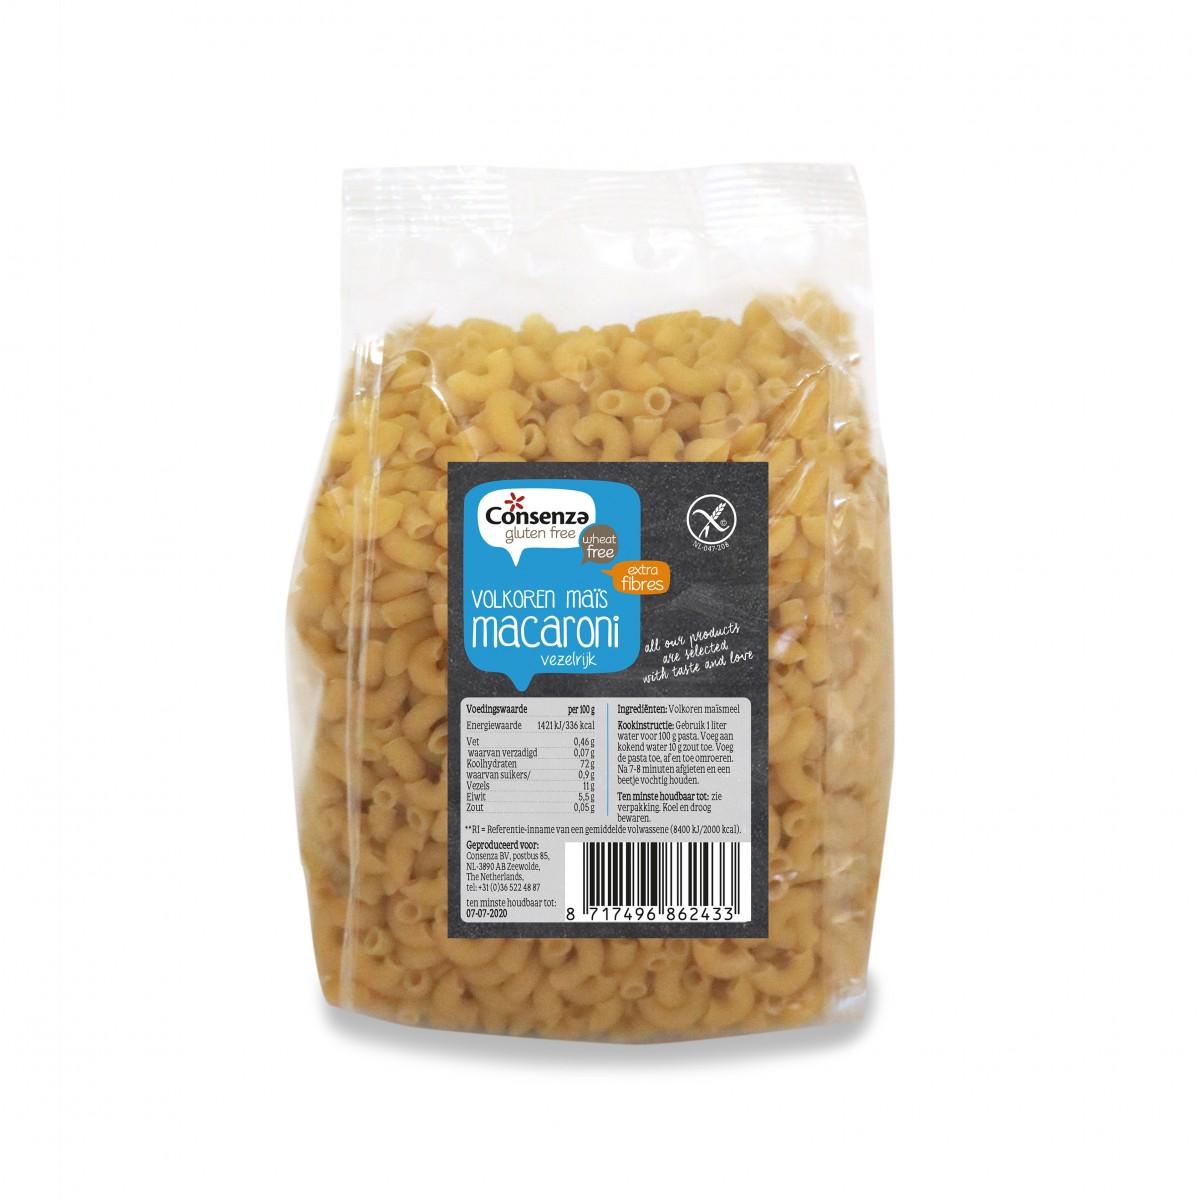 Volkoren Mais Macaroni